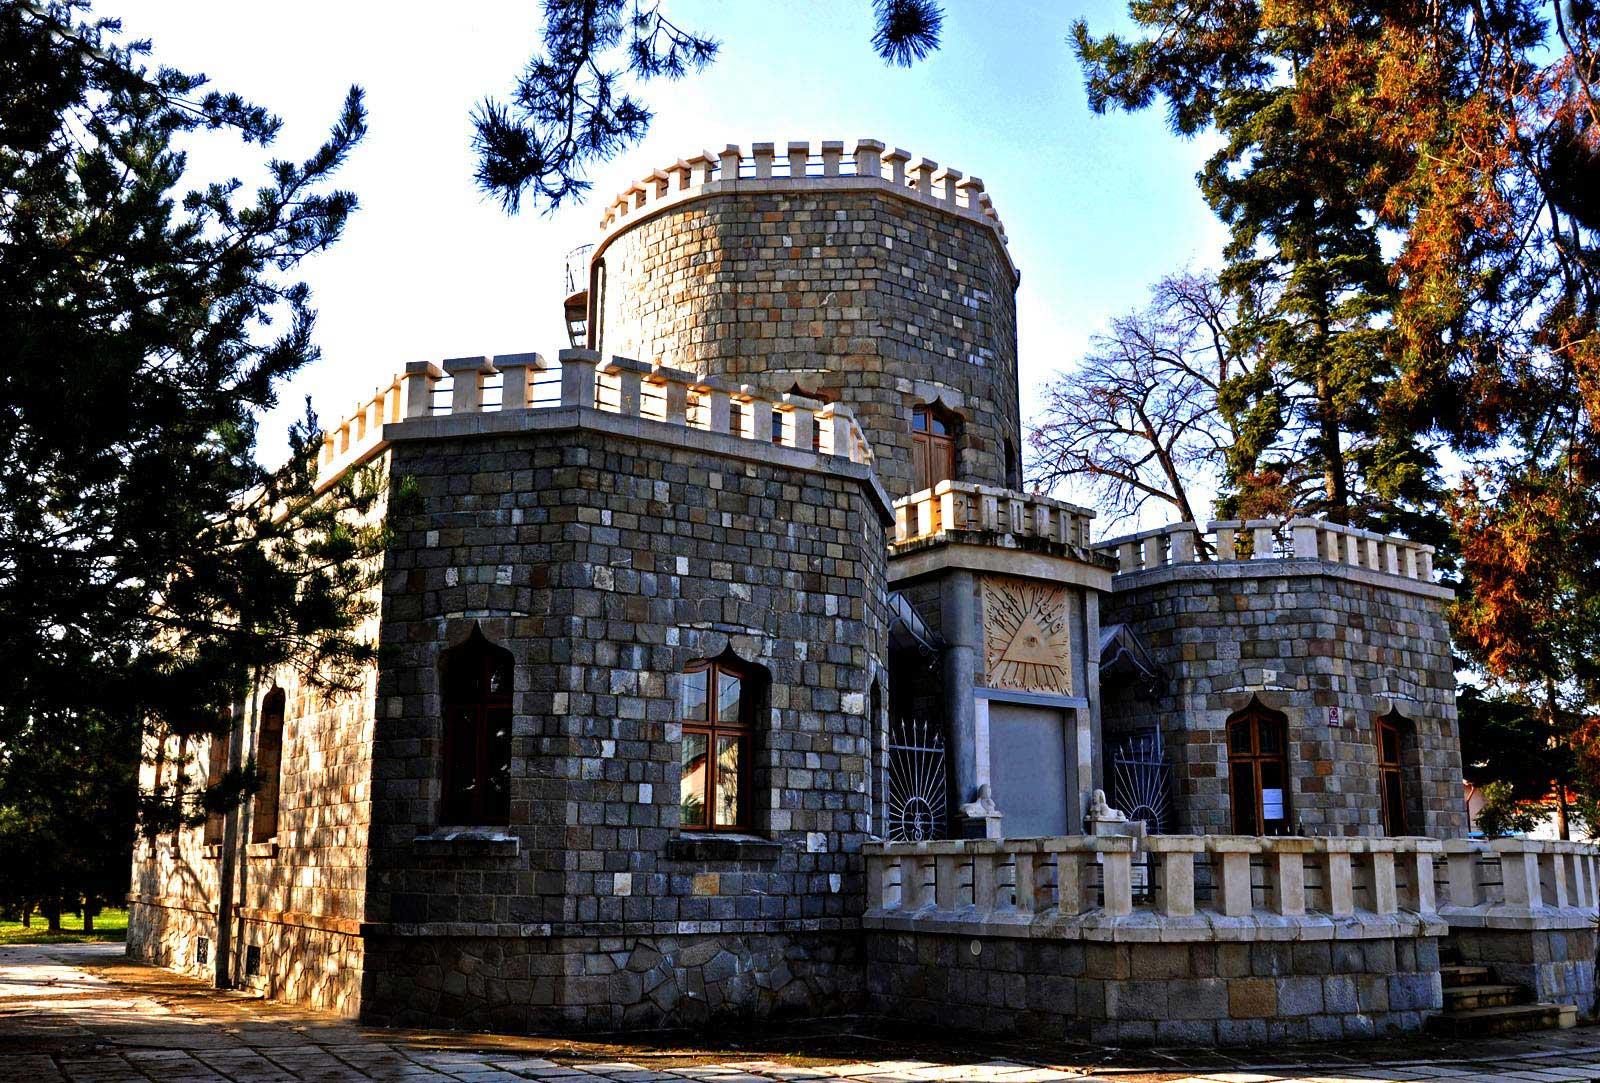 Iulia-Hasdeu-Castle